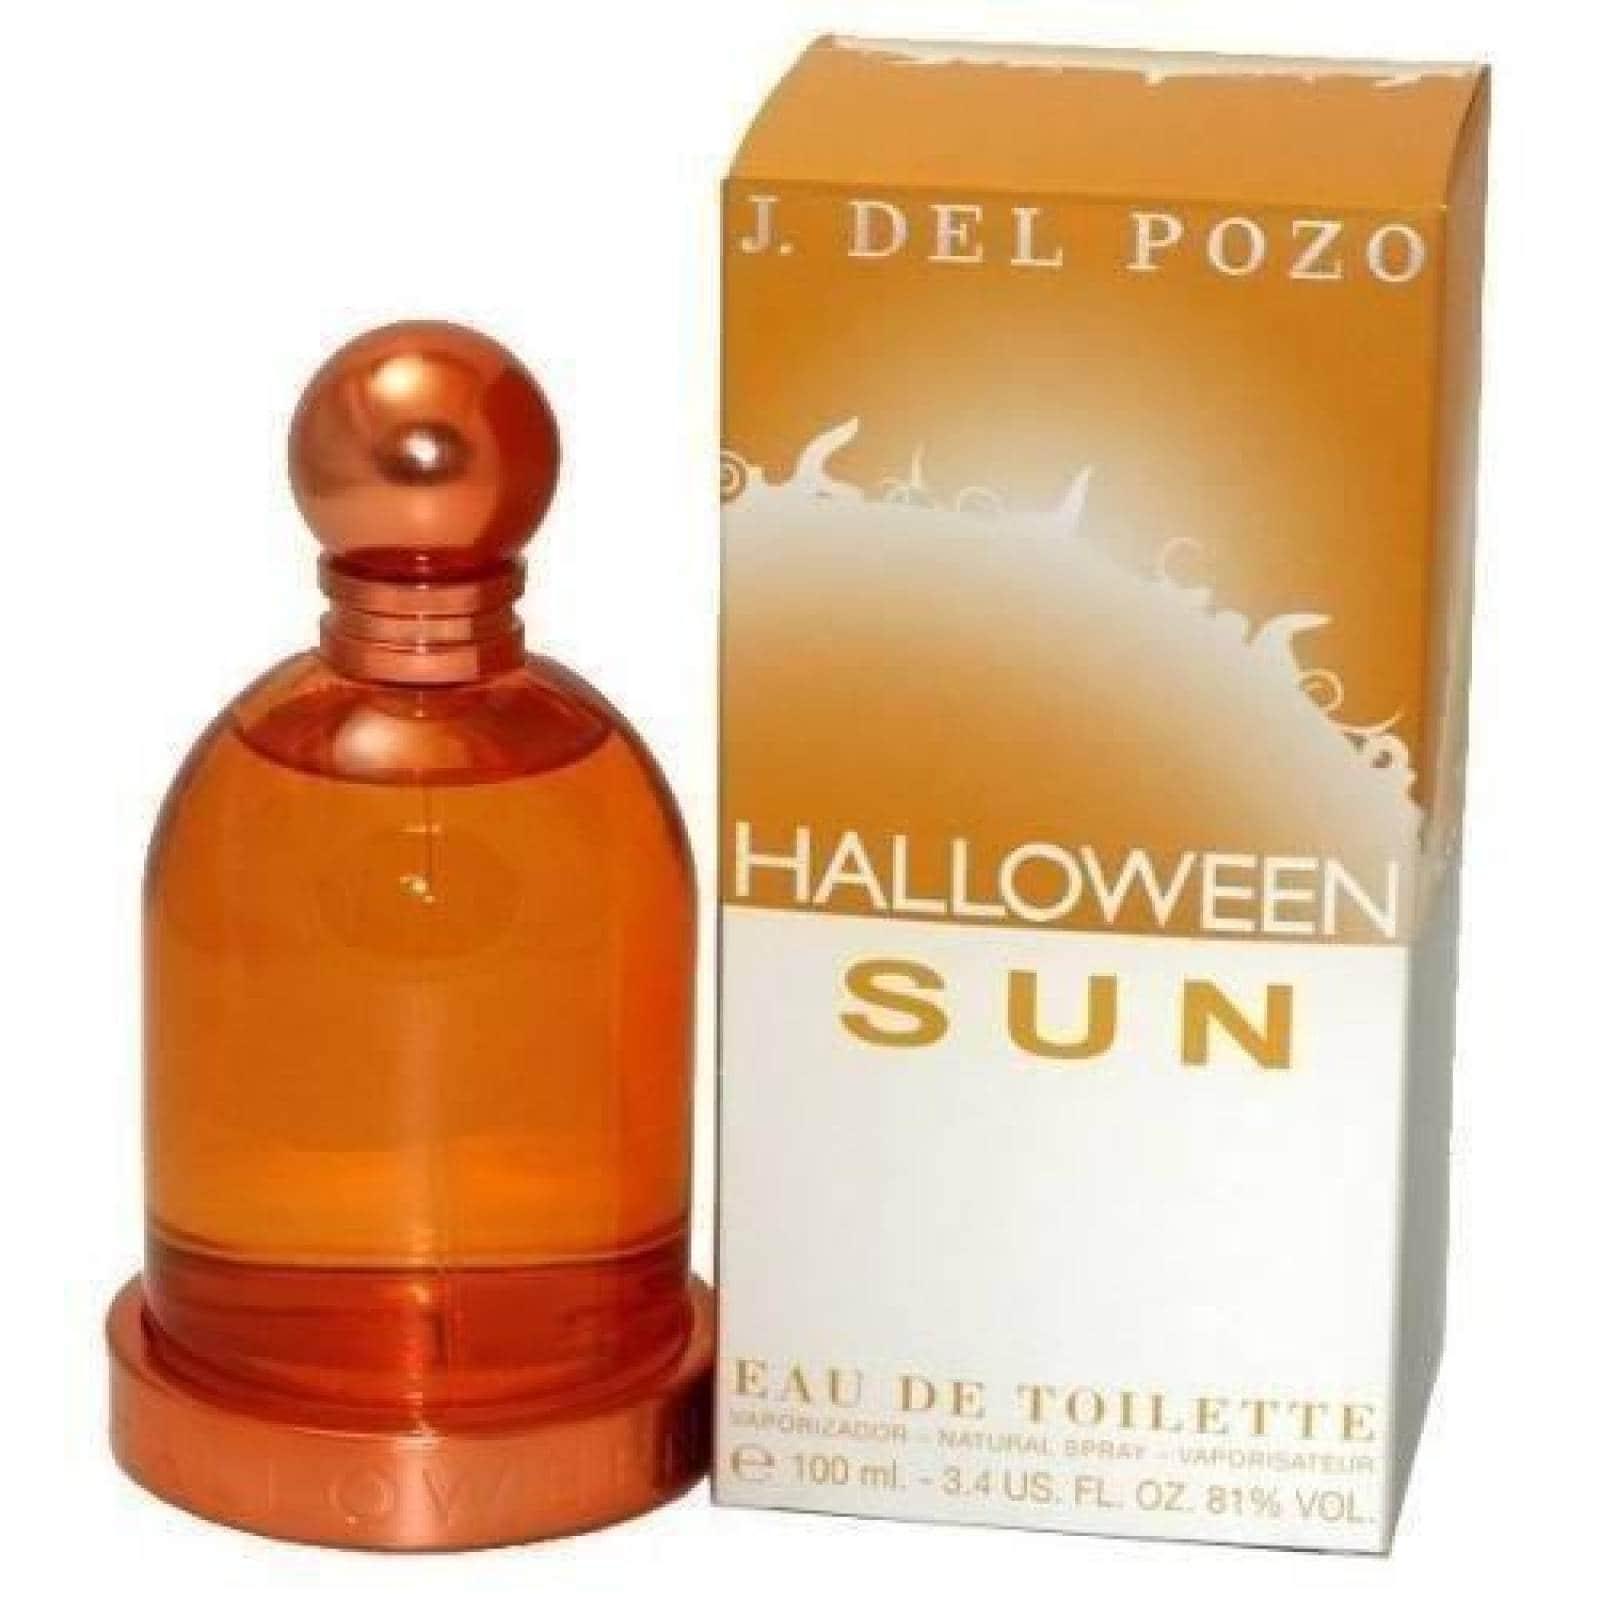 Halloween Sun Dama 100 Ml J. Del Pozo Spray - Original